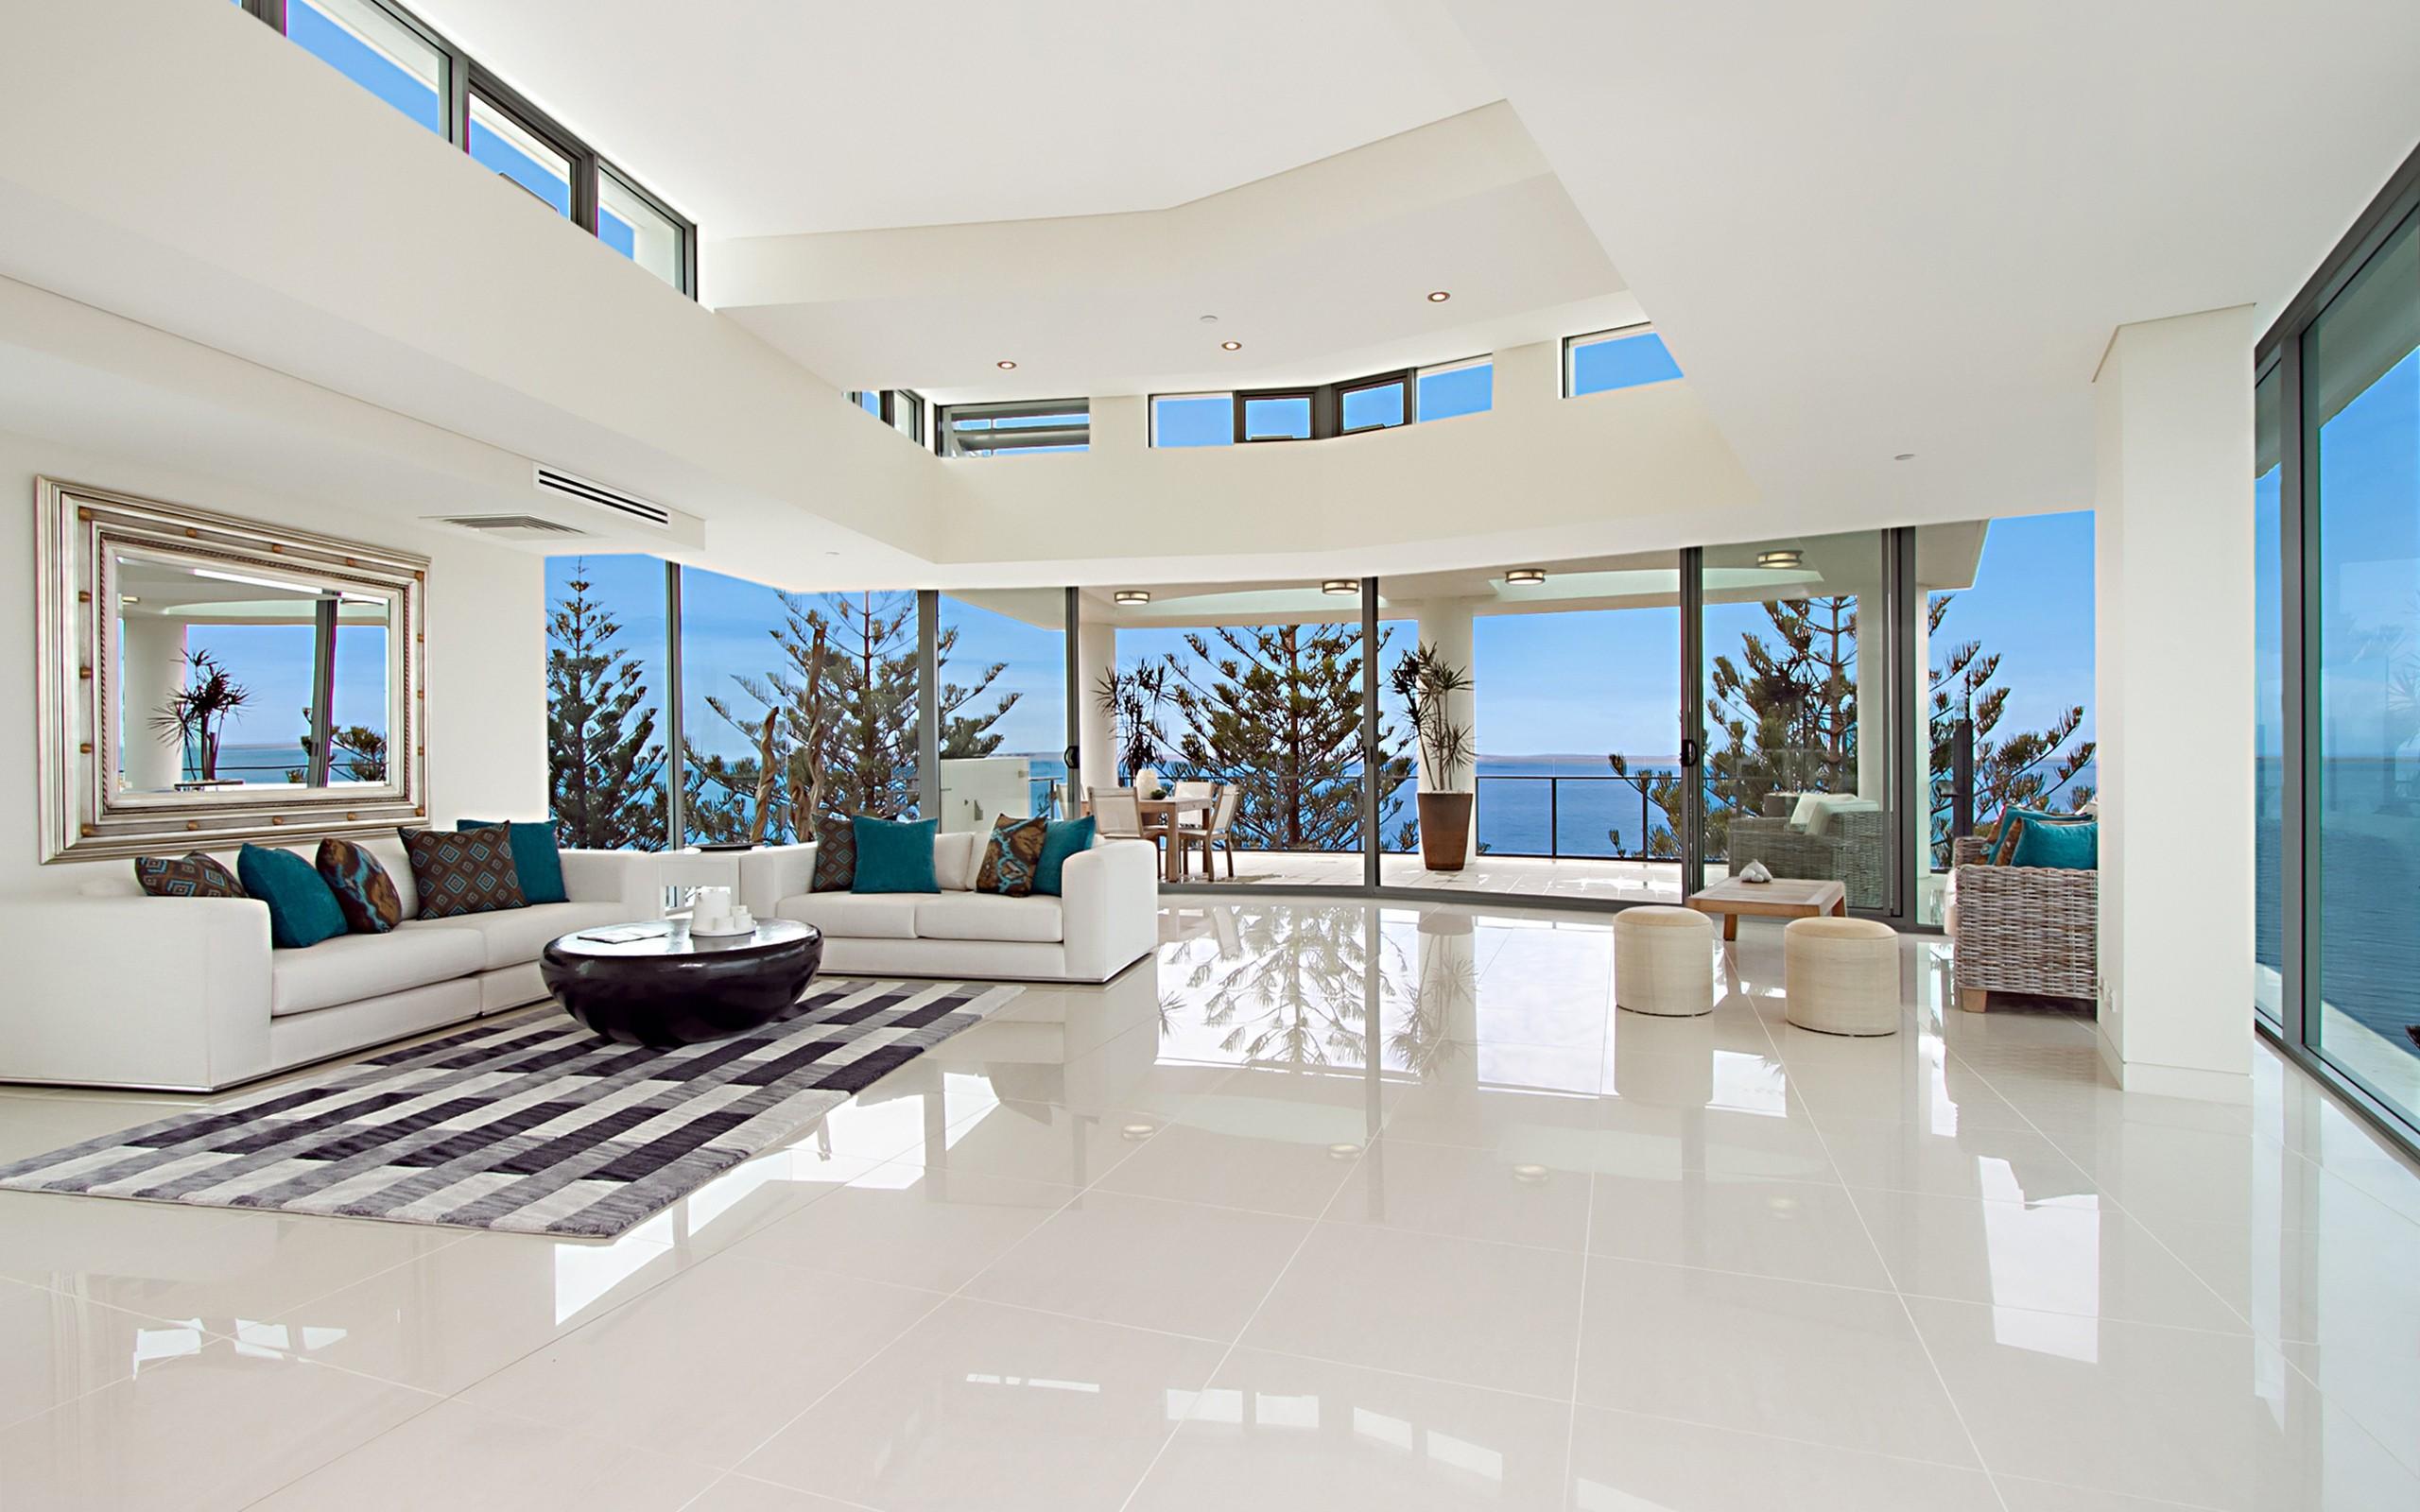 Diseño de una sala grande - 2560x1600